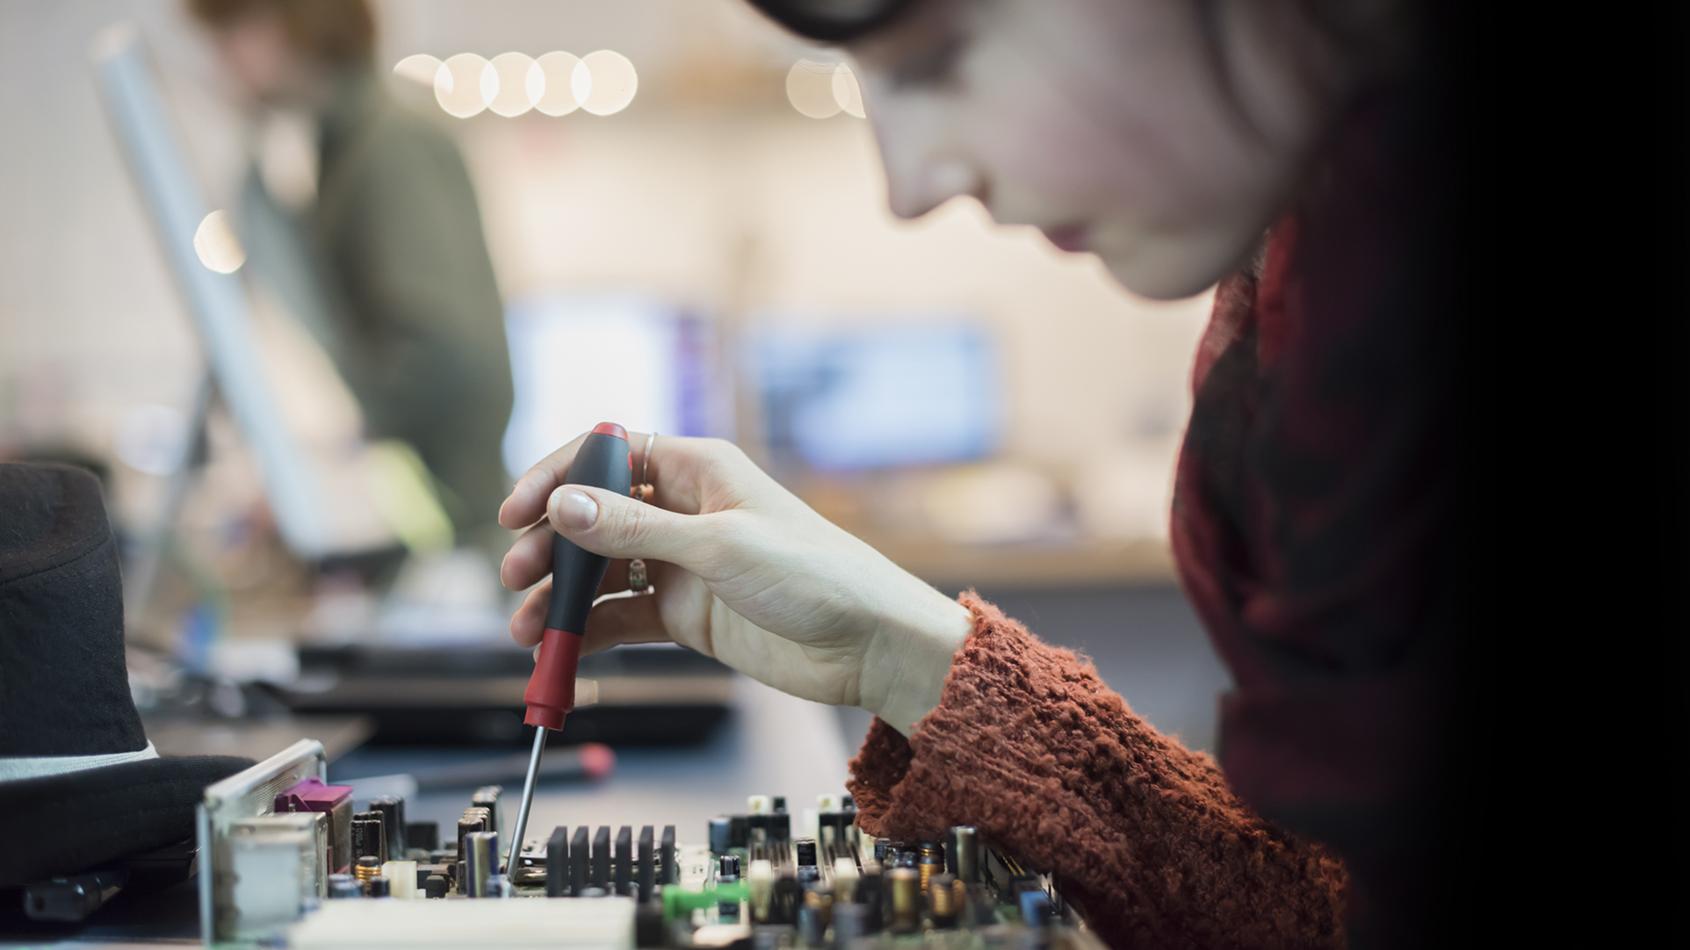 Real-world STEM activities